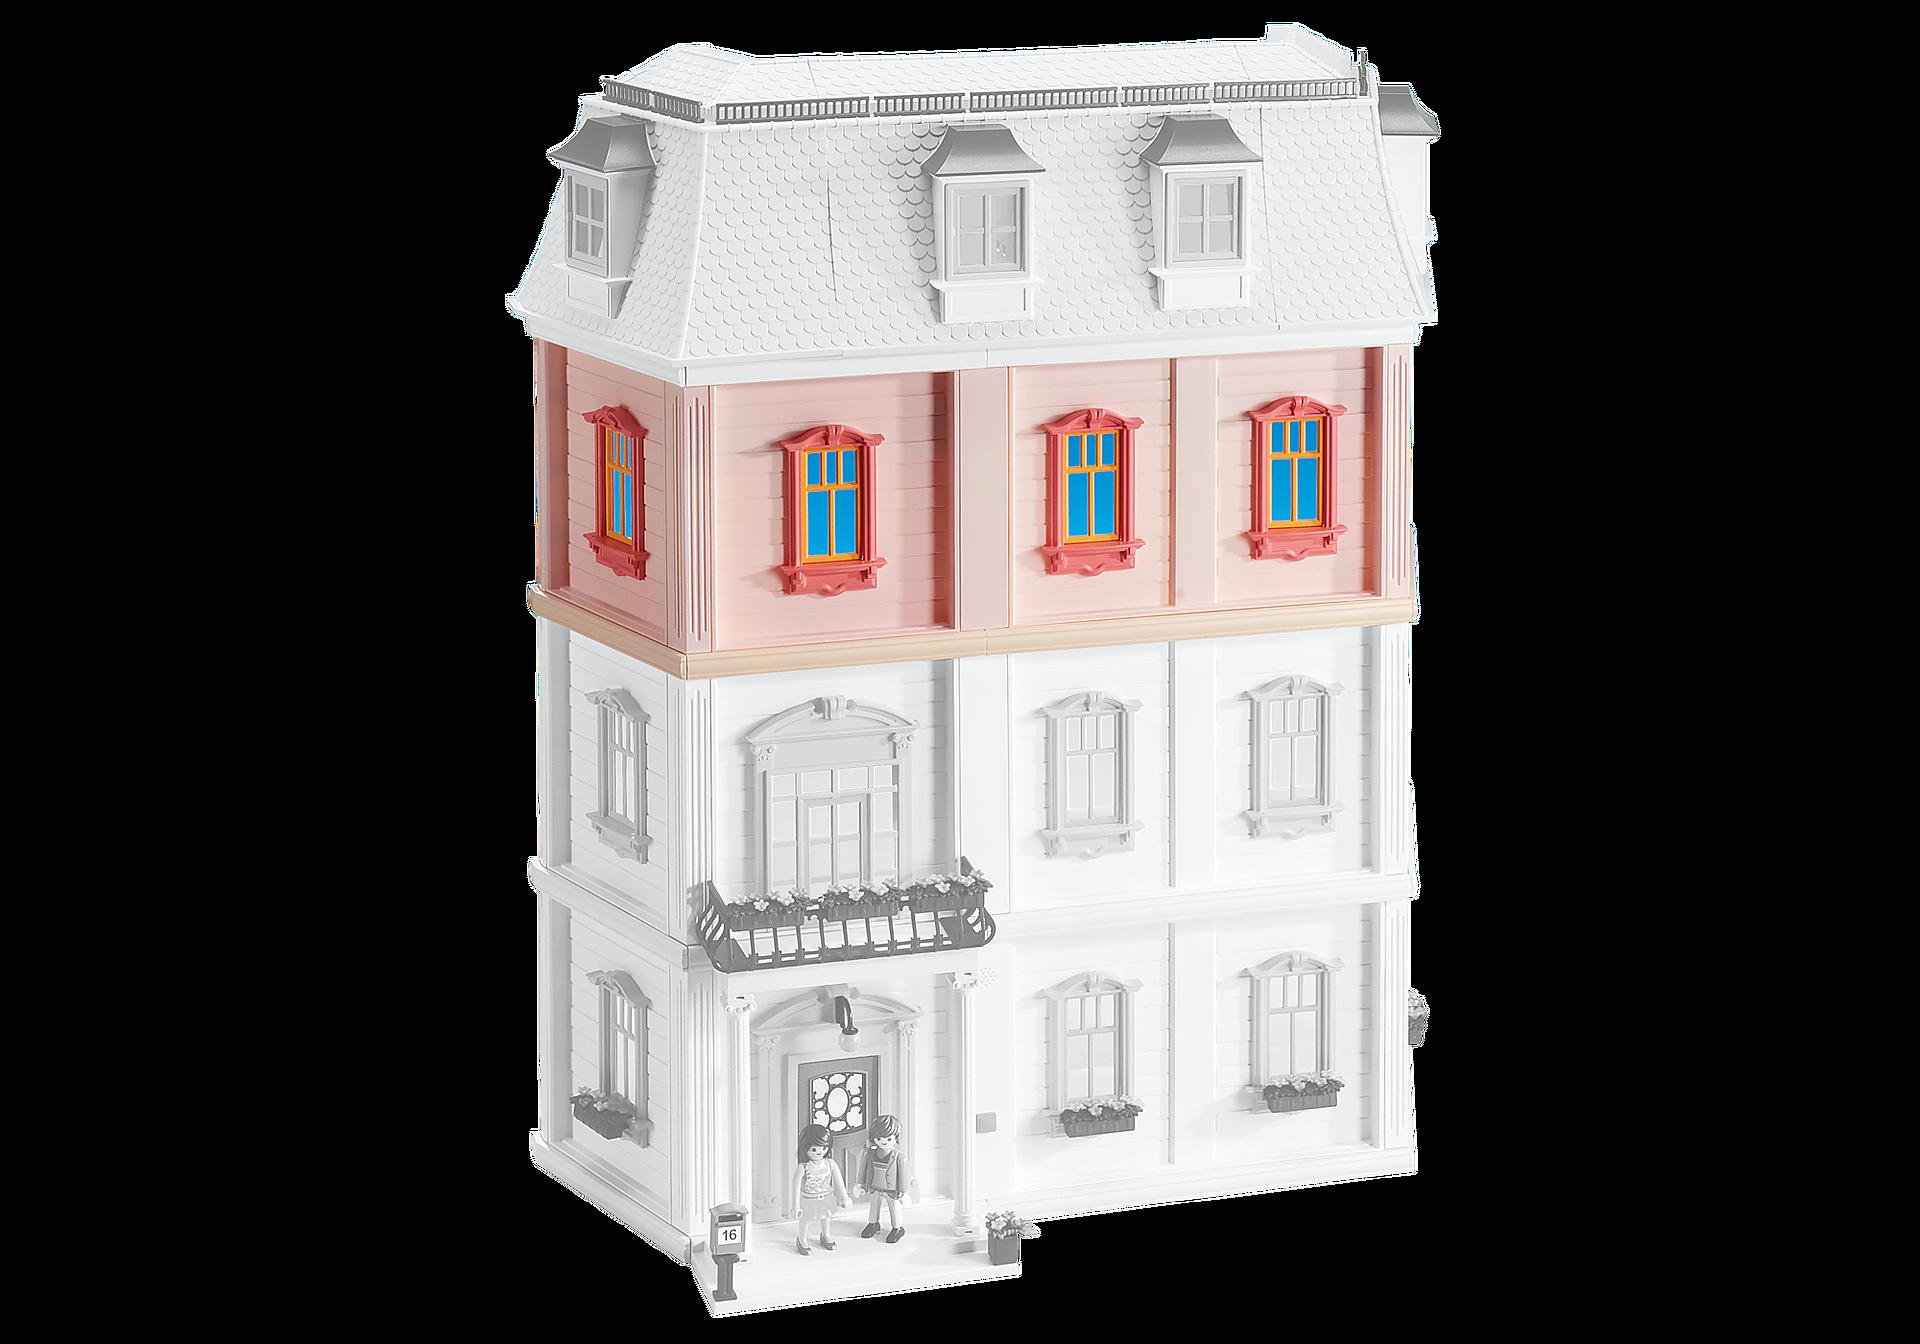 http://media.playmobil.com/i/playmobil/6453_product_detail/Casa delle bambole estensione B